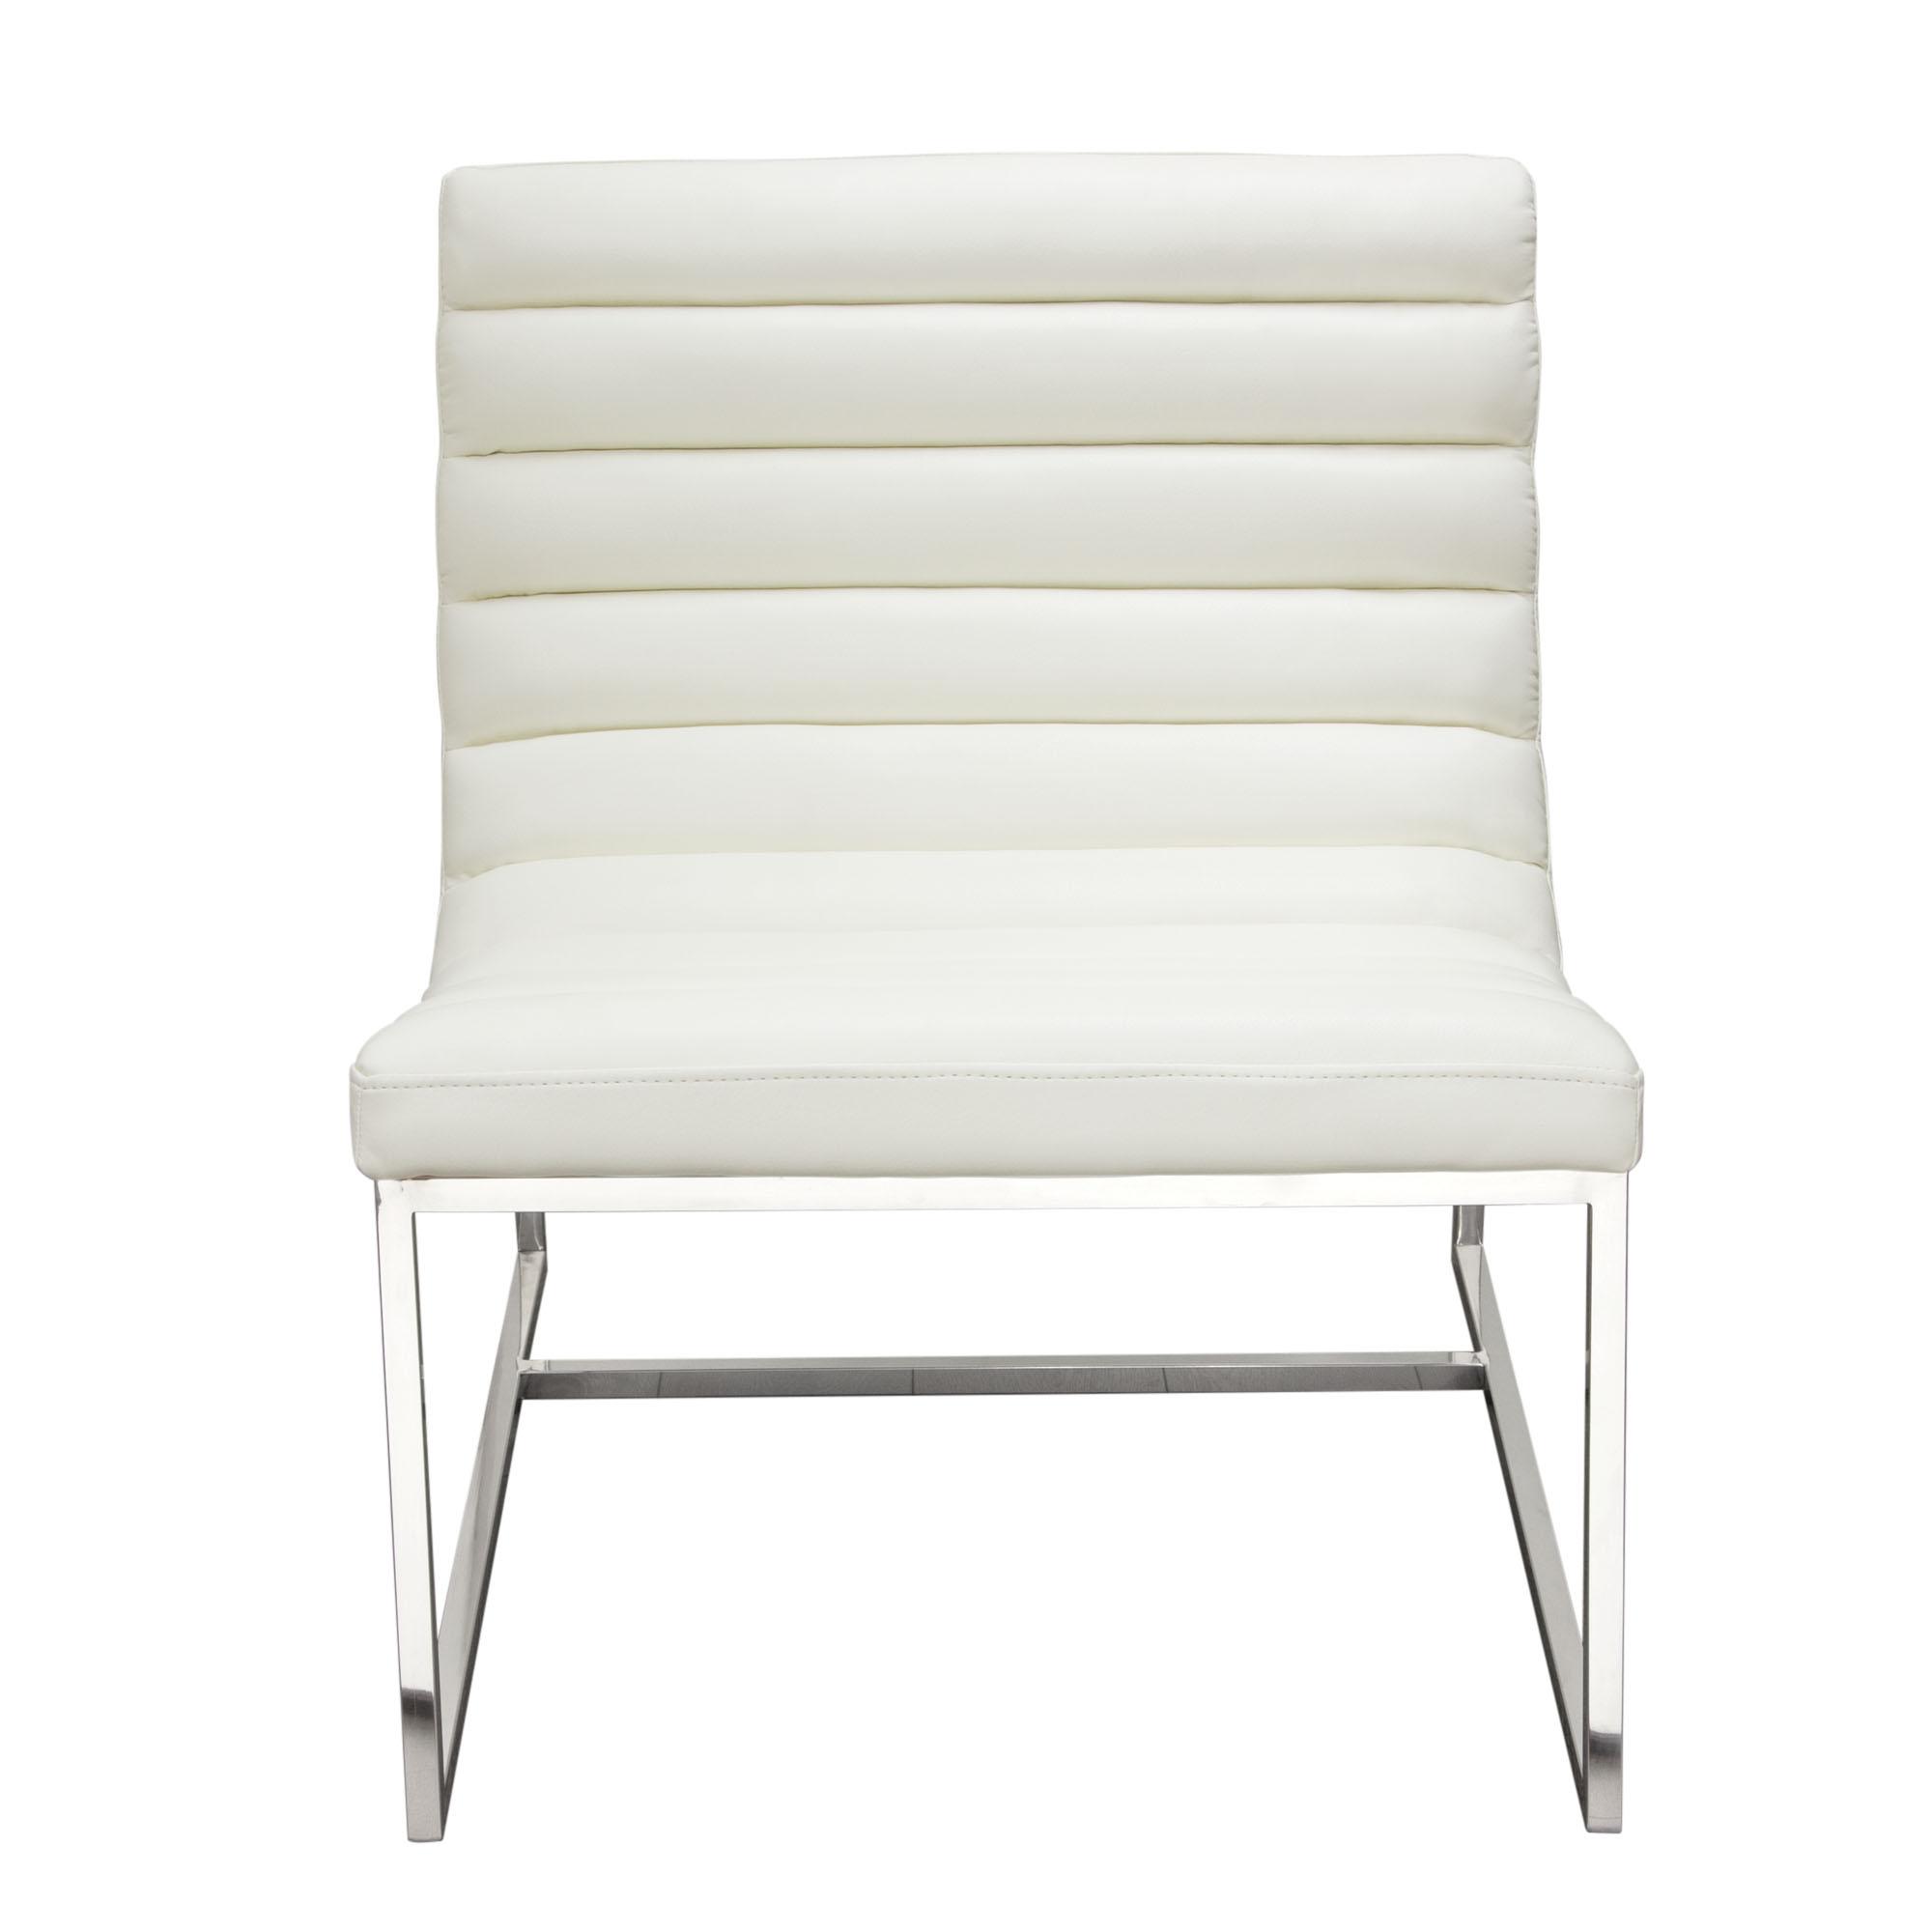 Bardot Lounge Chair w/ Stainless Steel Frame by Diamond Sofa   eBay